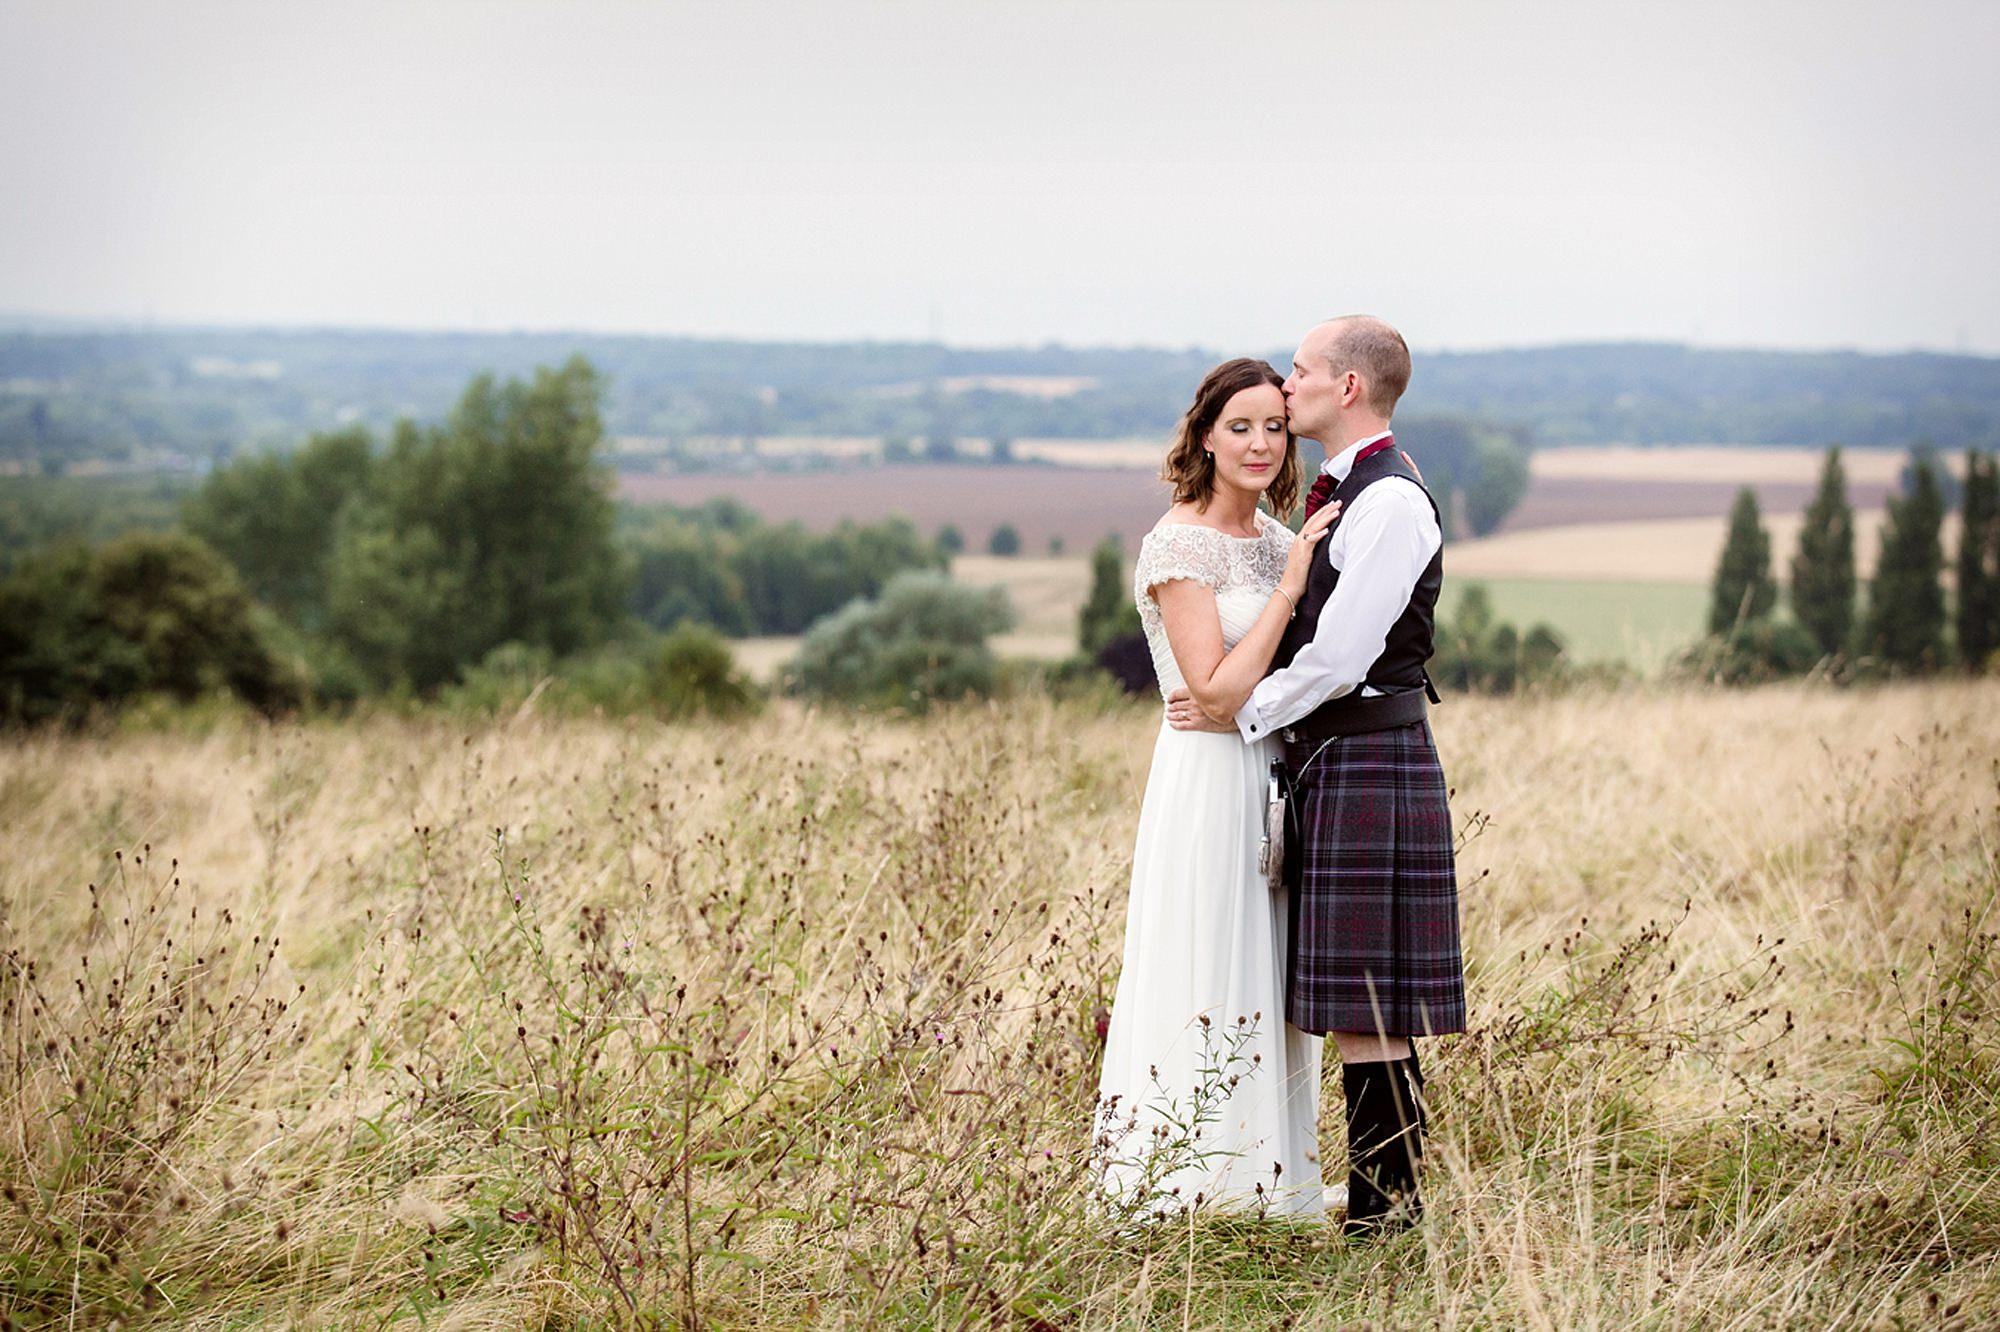 outdoor humanist wedding photography groom kissing bride